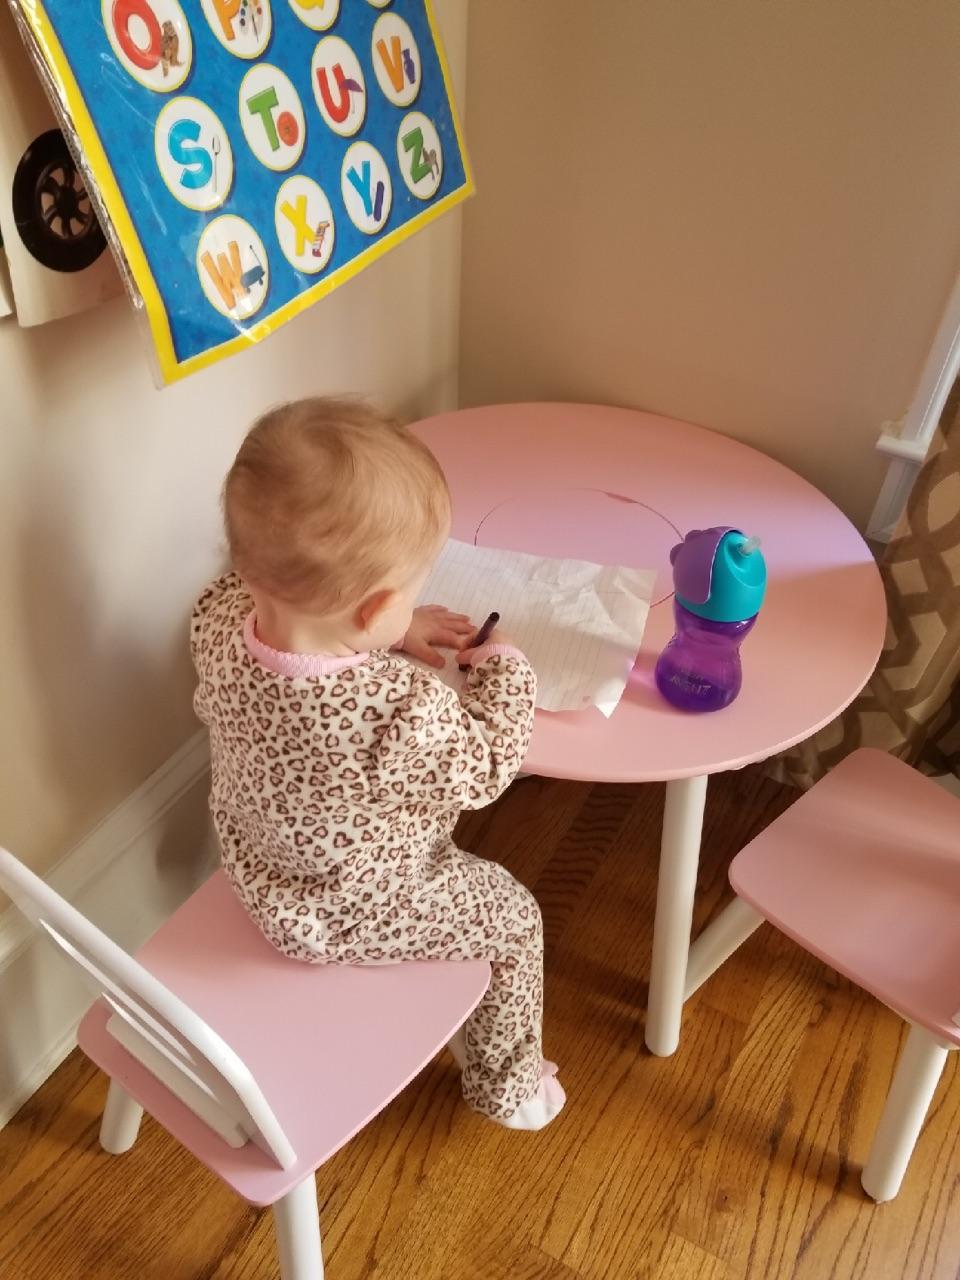 Baby writing at table